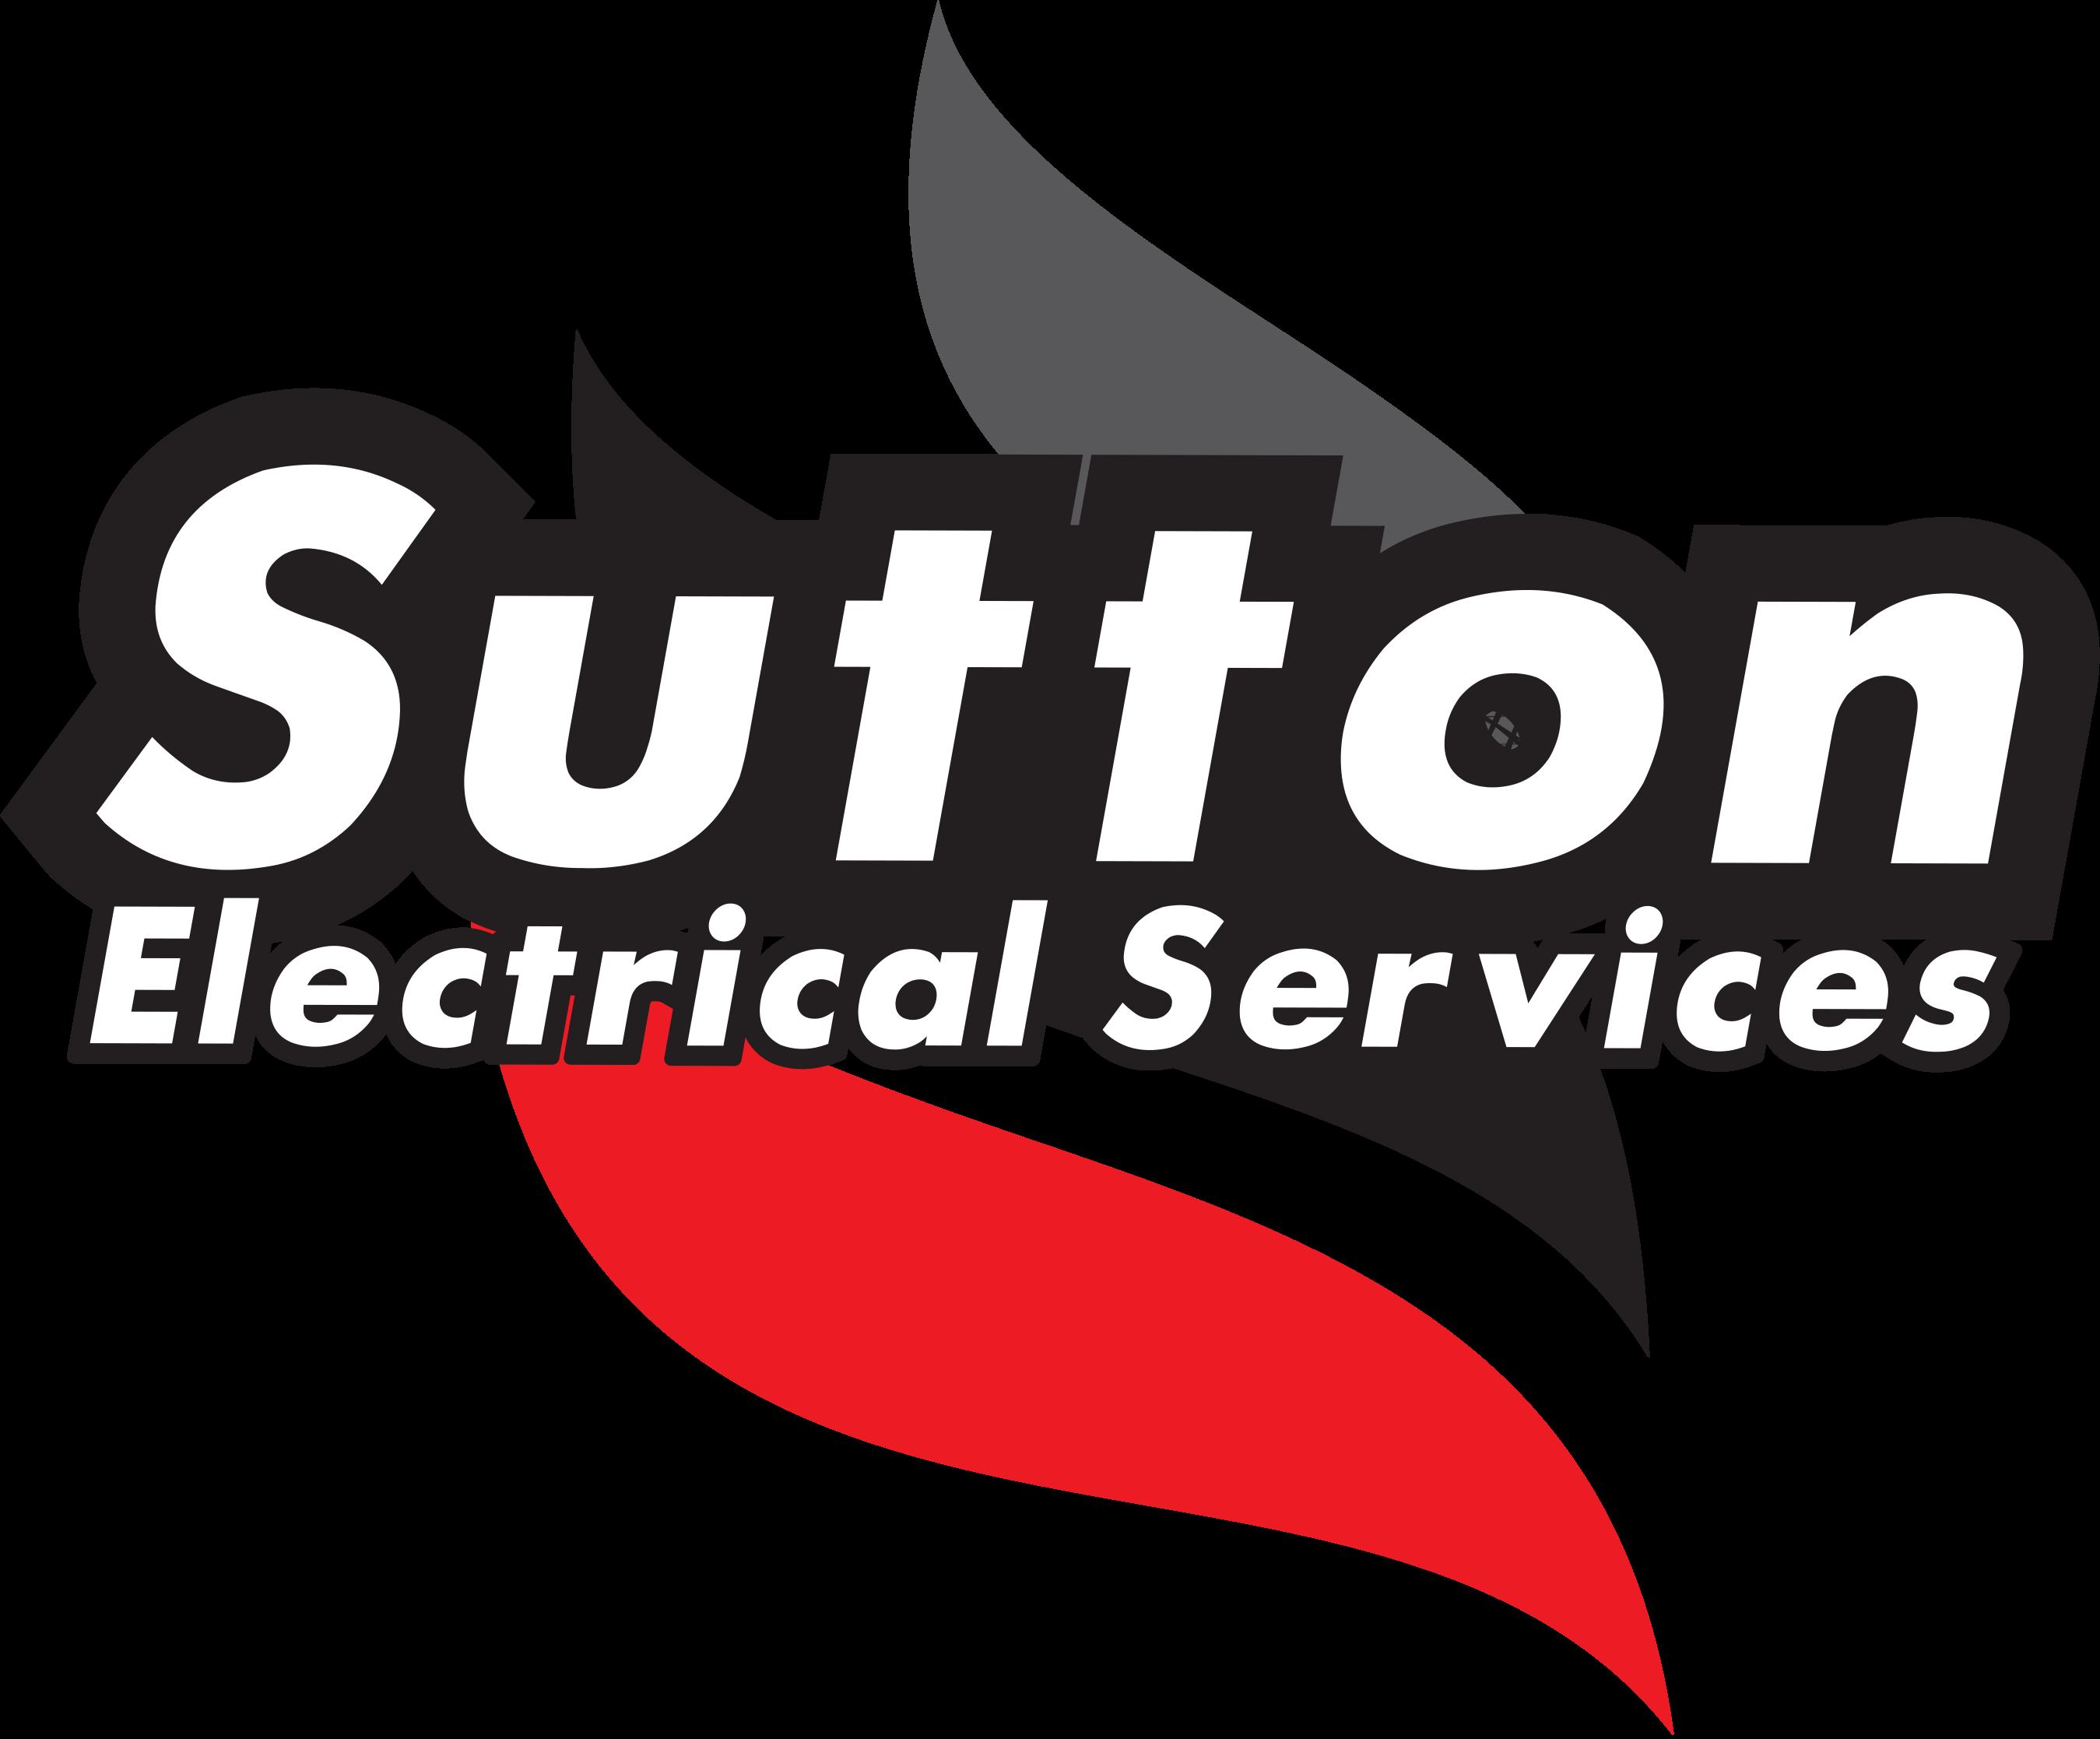 Sutton Electrical Services